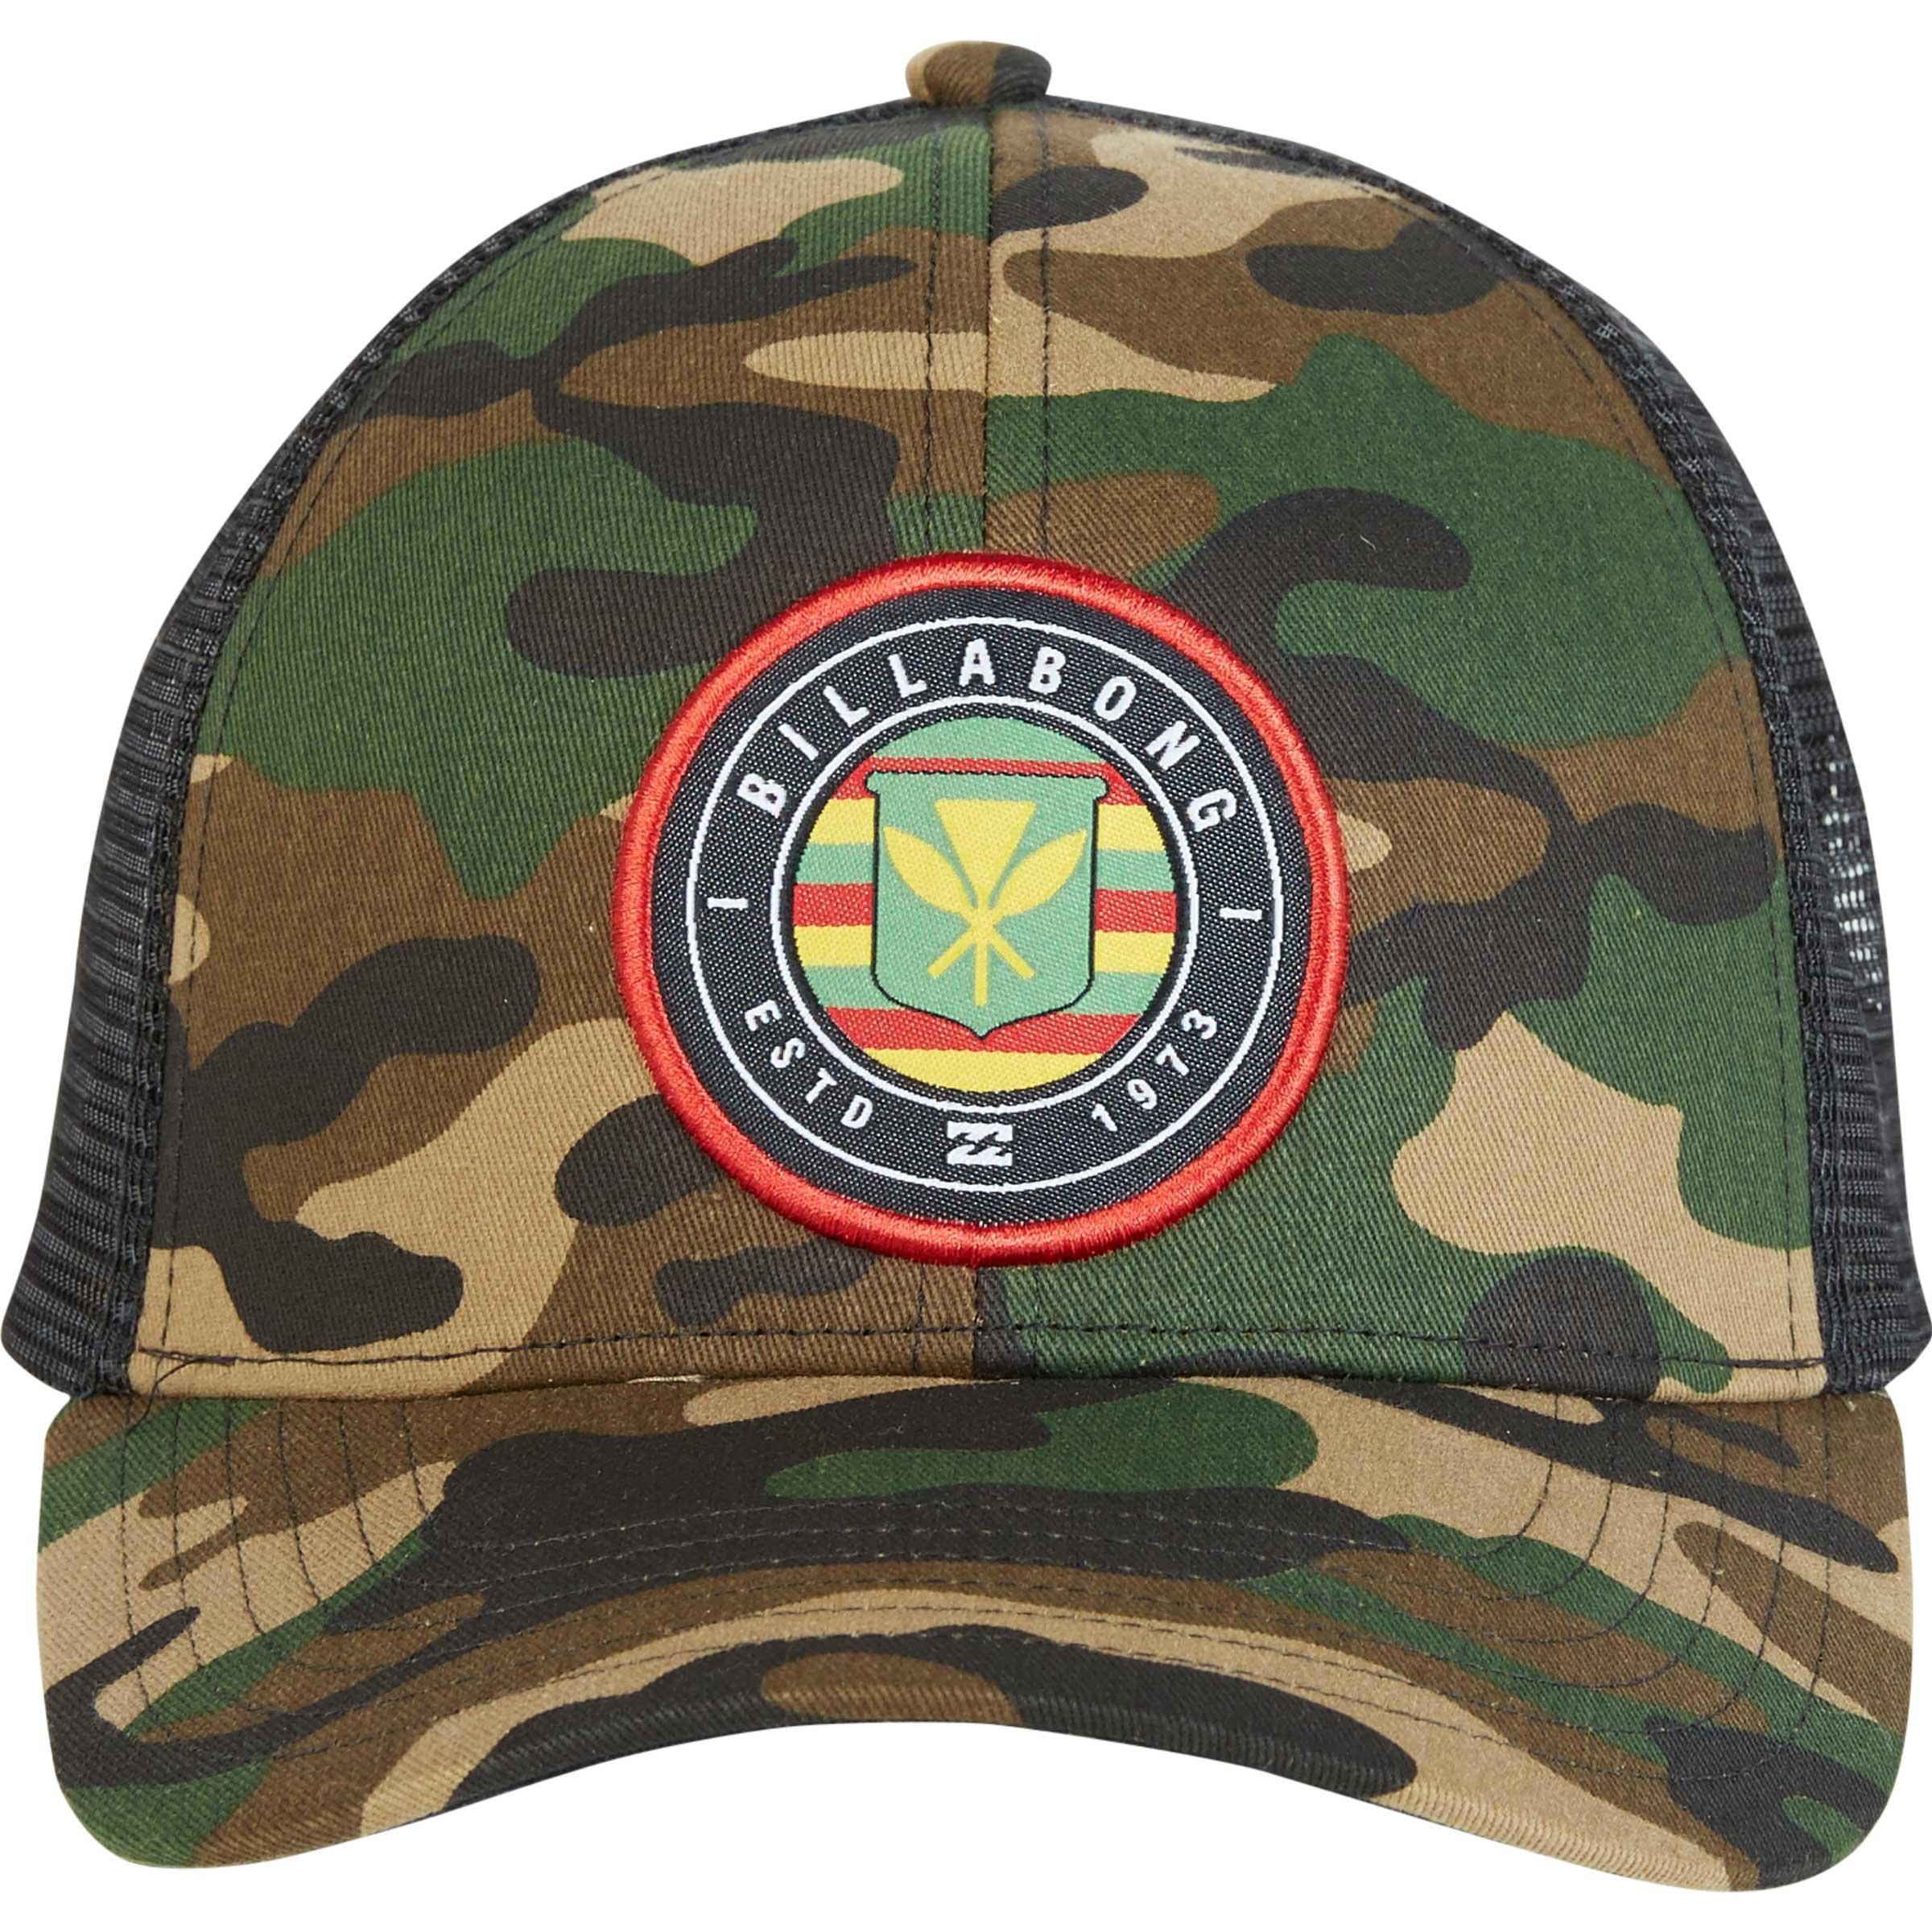 size 40 31eb7 3314e ... discount code for billabong multicolor native rotor camo trucker hat  for men lyst. view fullscreen